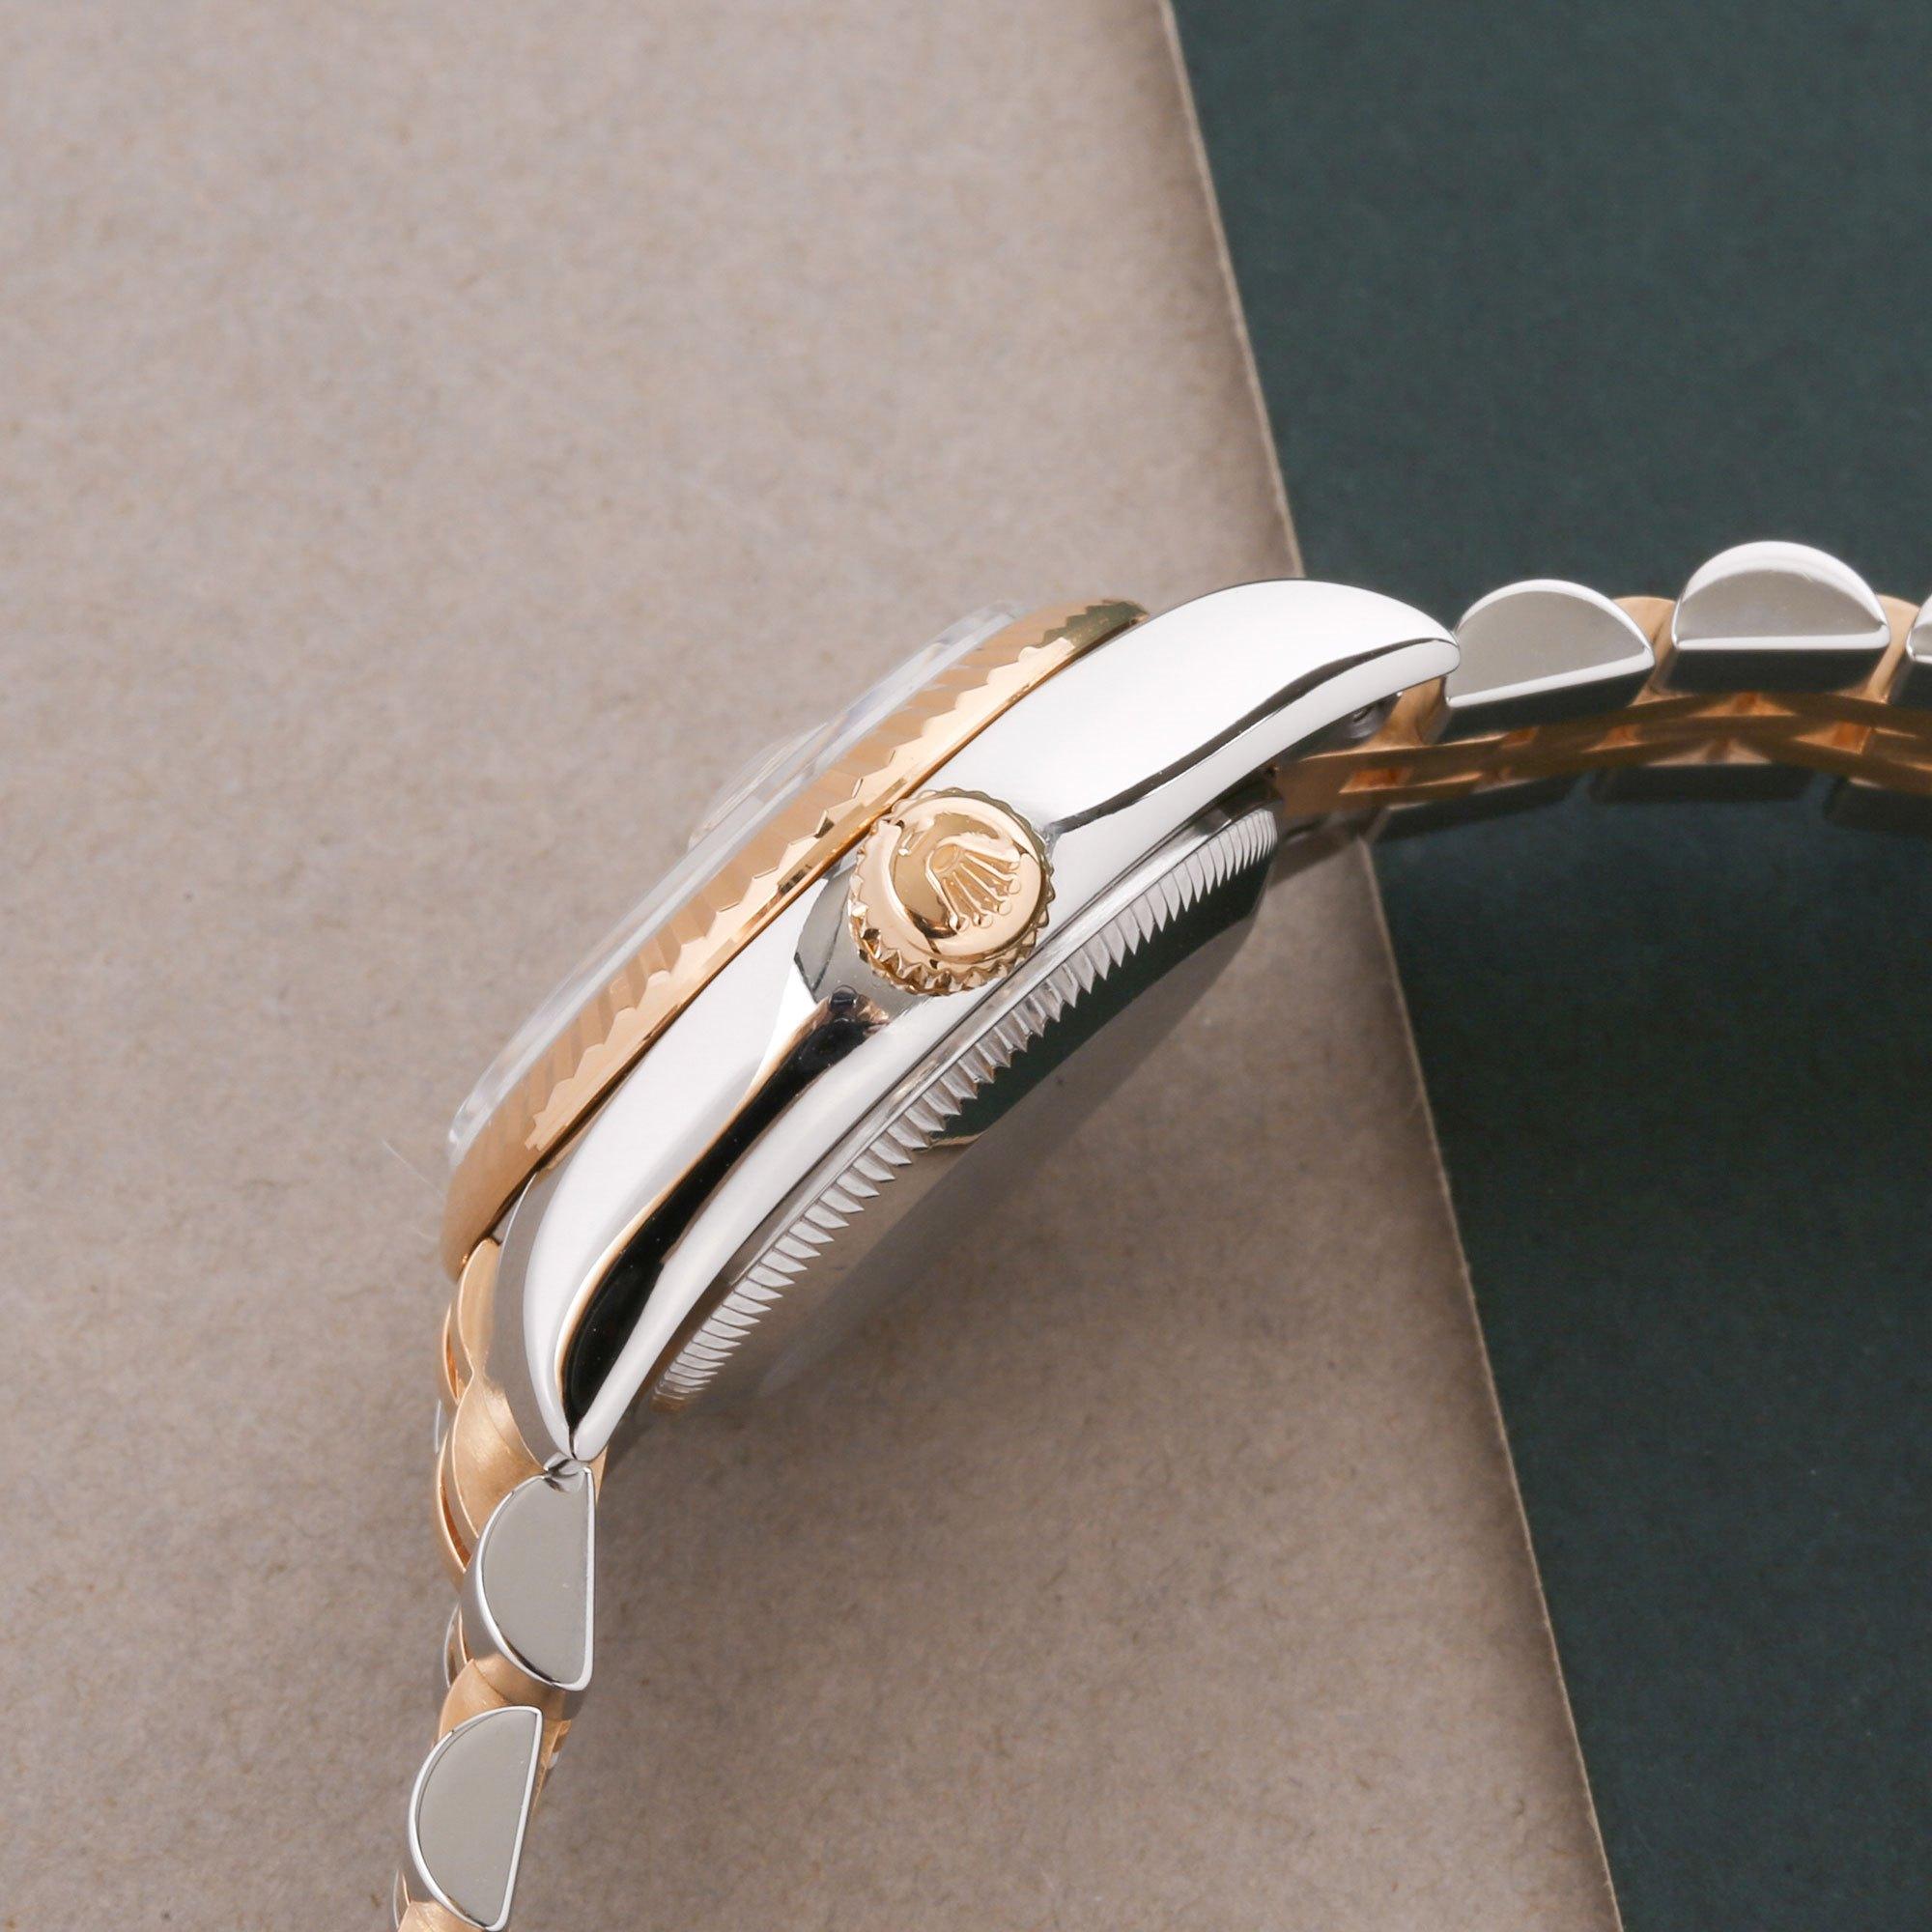 Rolex Datejust 26 Diamond Stainless Steel & Yellow Gold 179173G